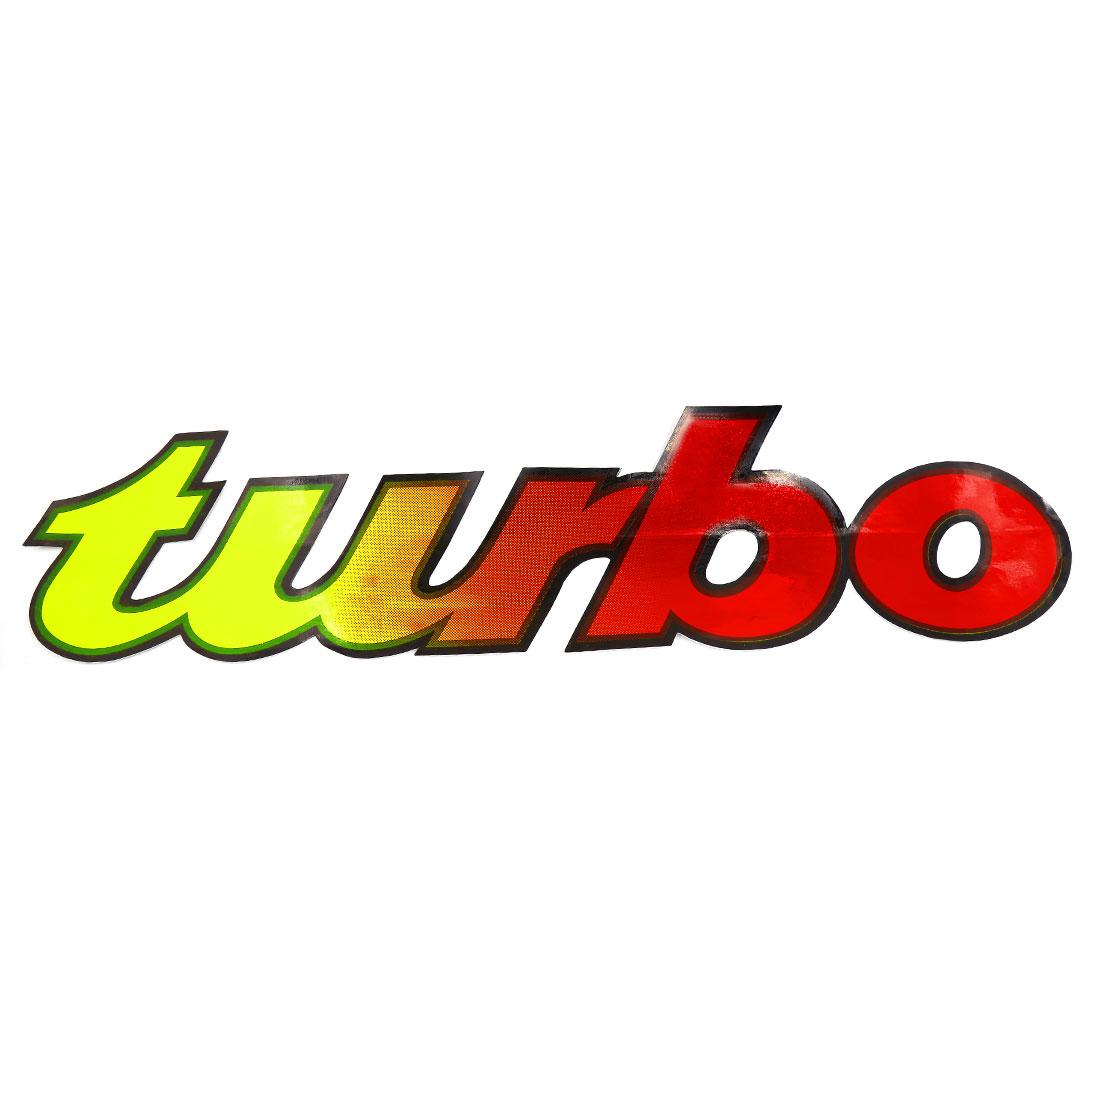 58cmx14cm Car Exterior Self-adhesive Sticker TURBO Pattern Design Graphic Decal